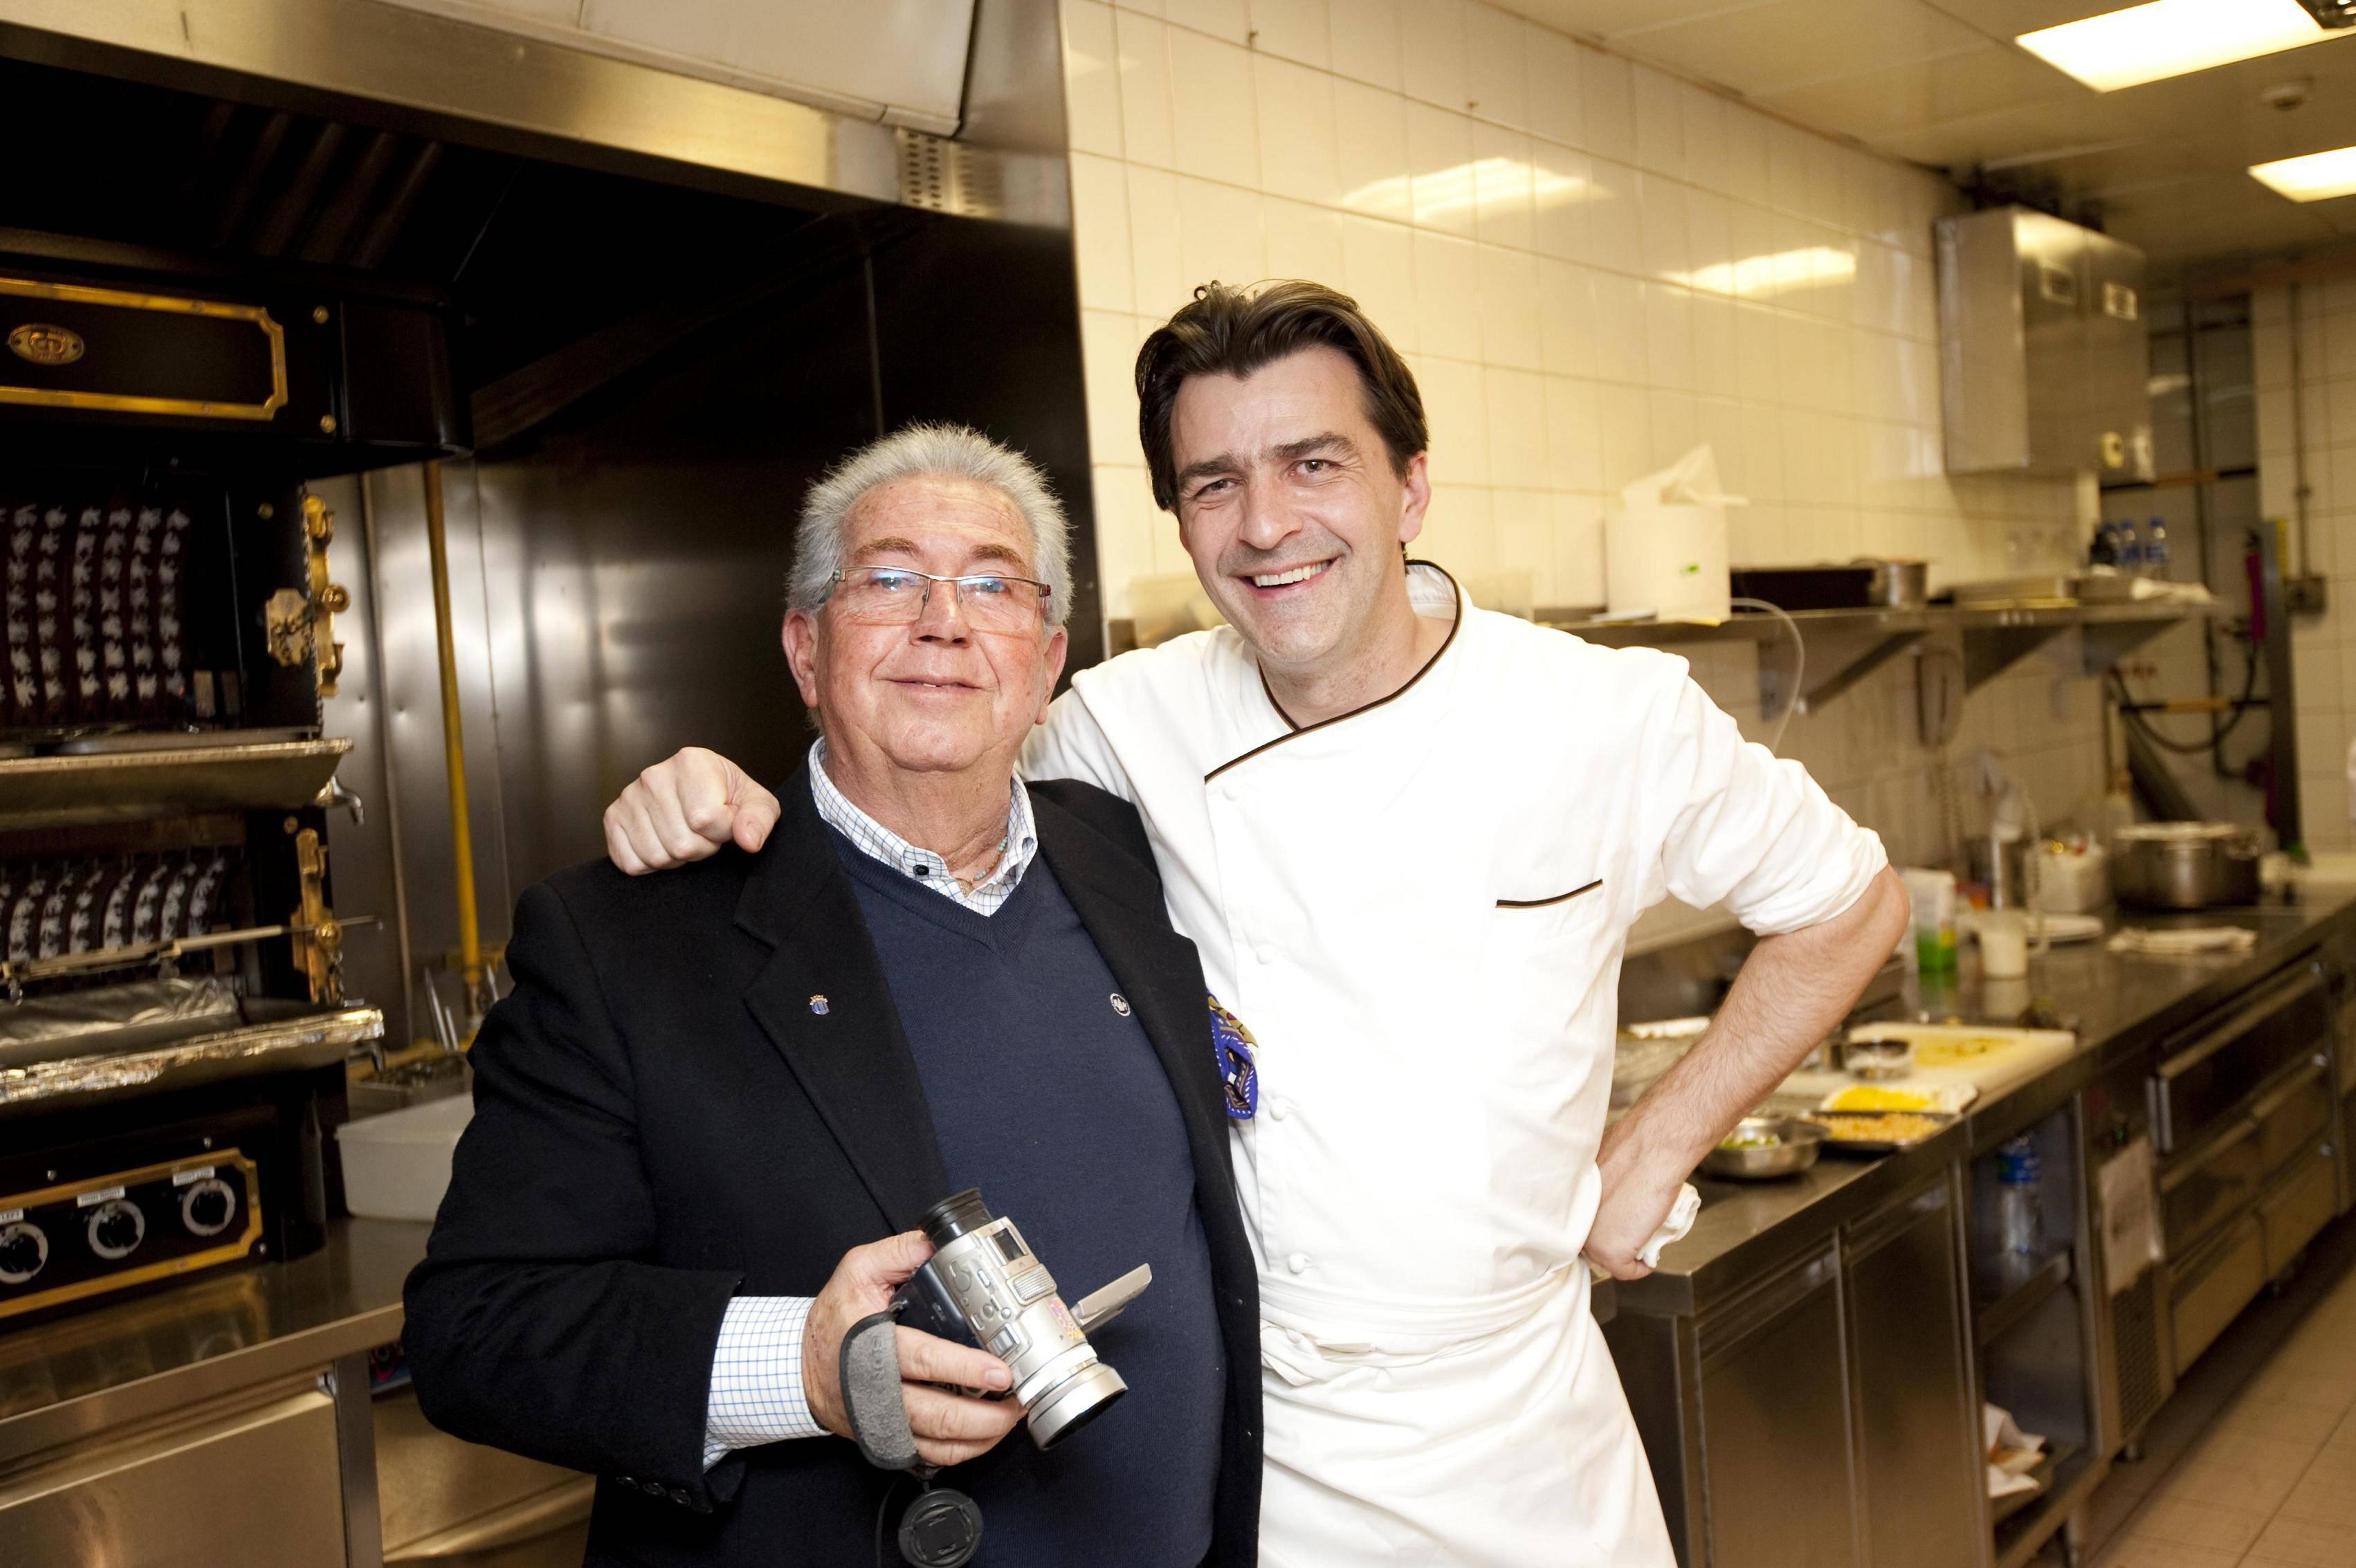 Mr.Jerry Bortolan and Chef Yannick